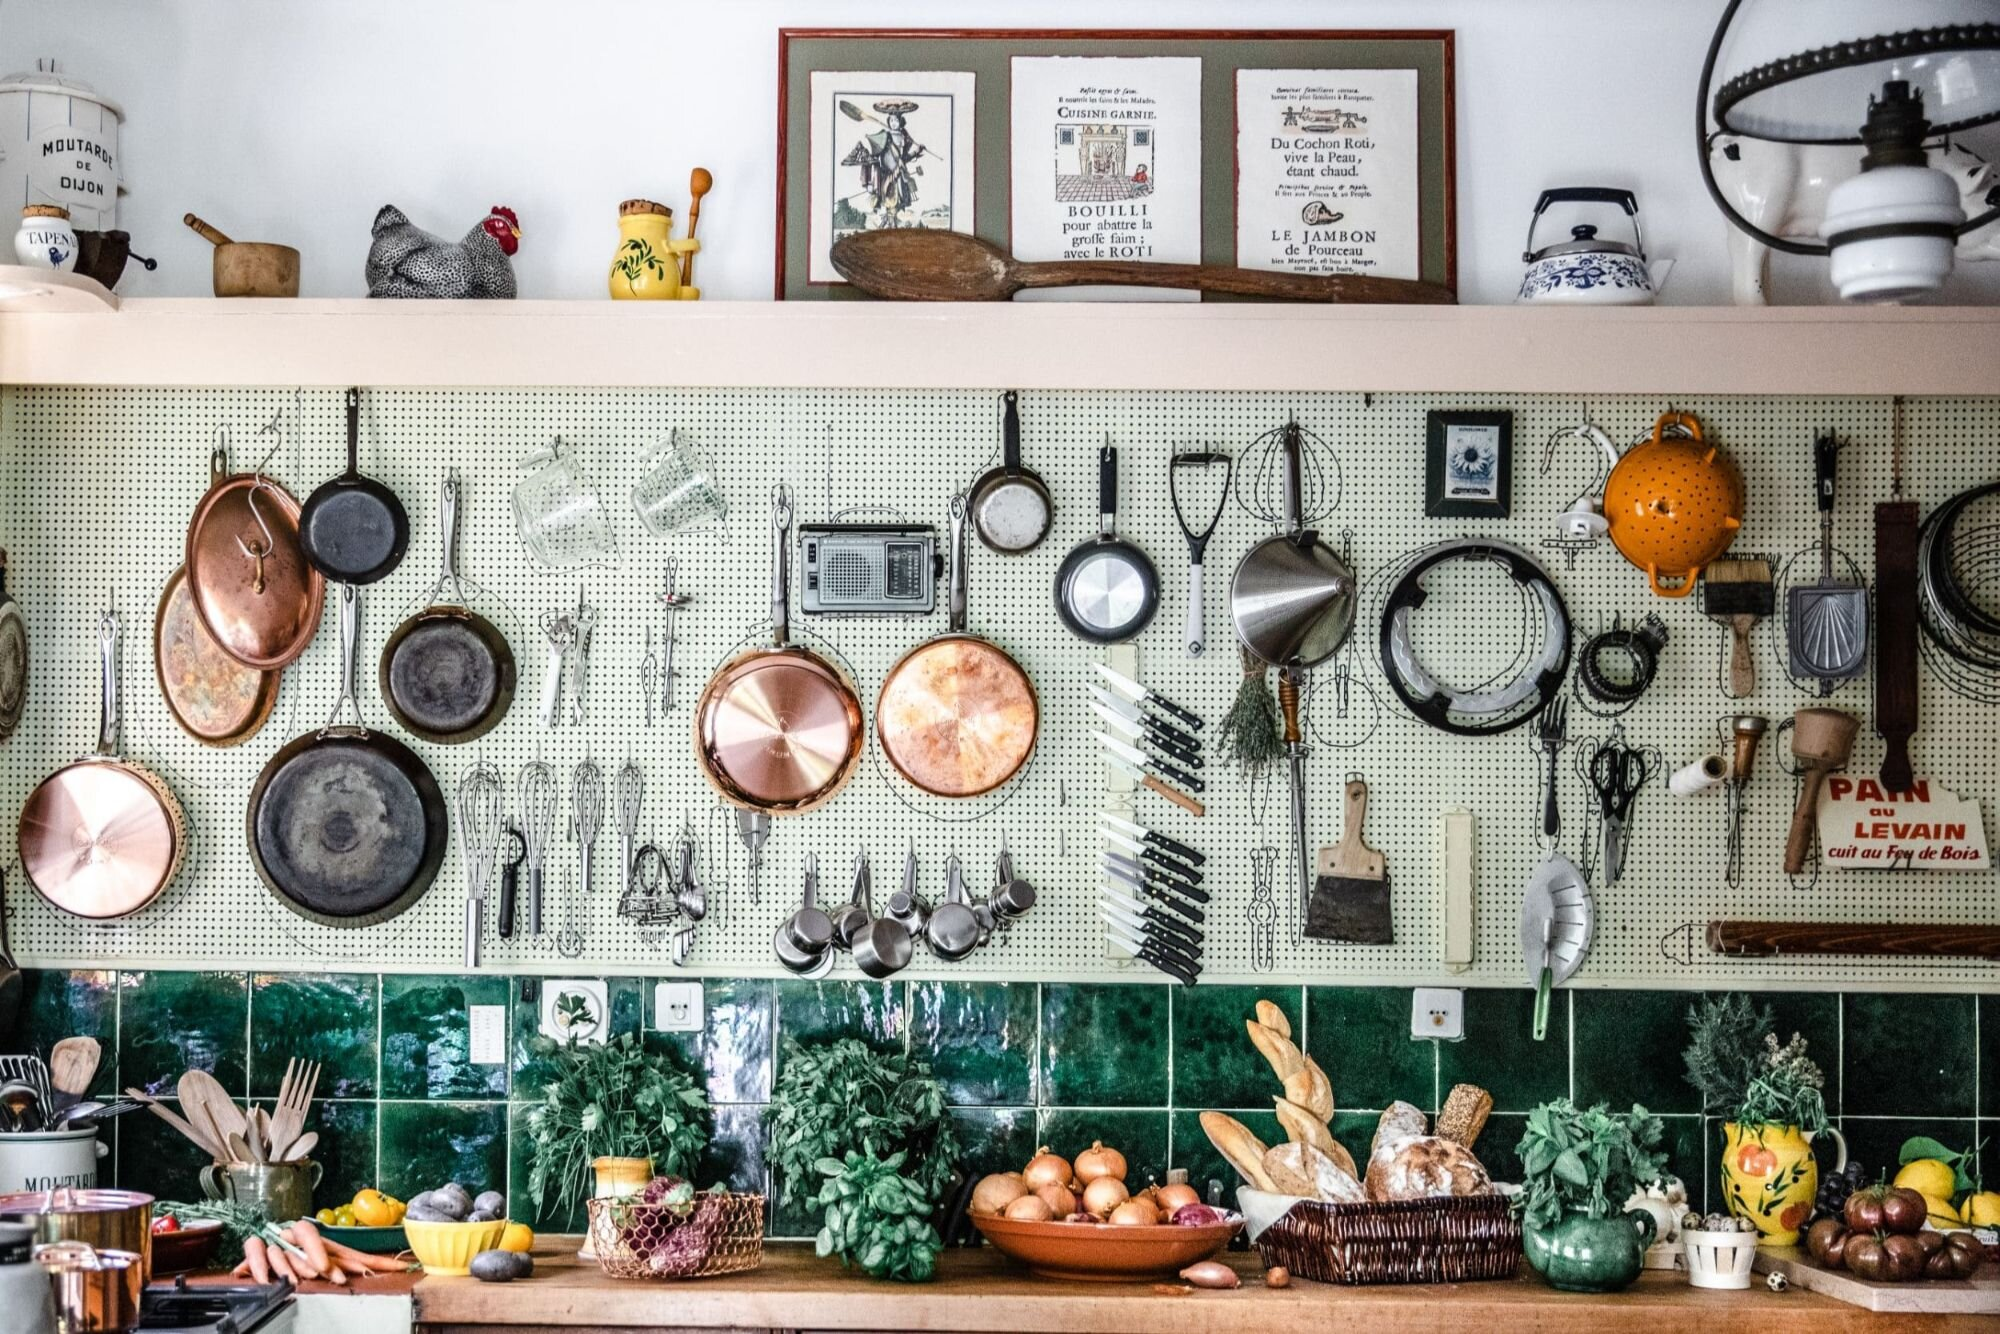 Courageous Cooking School La Peetch